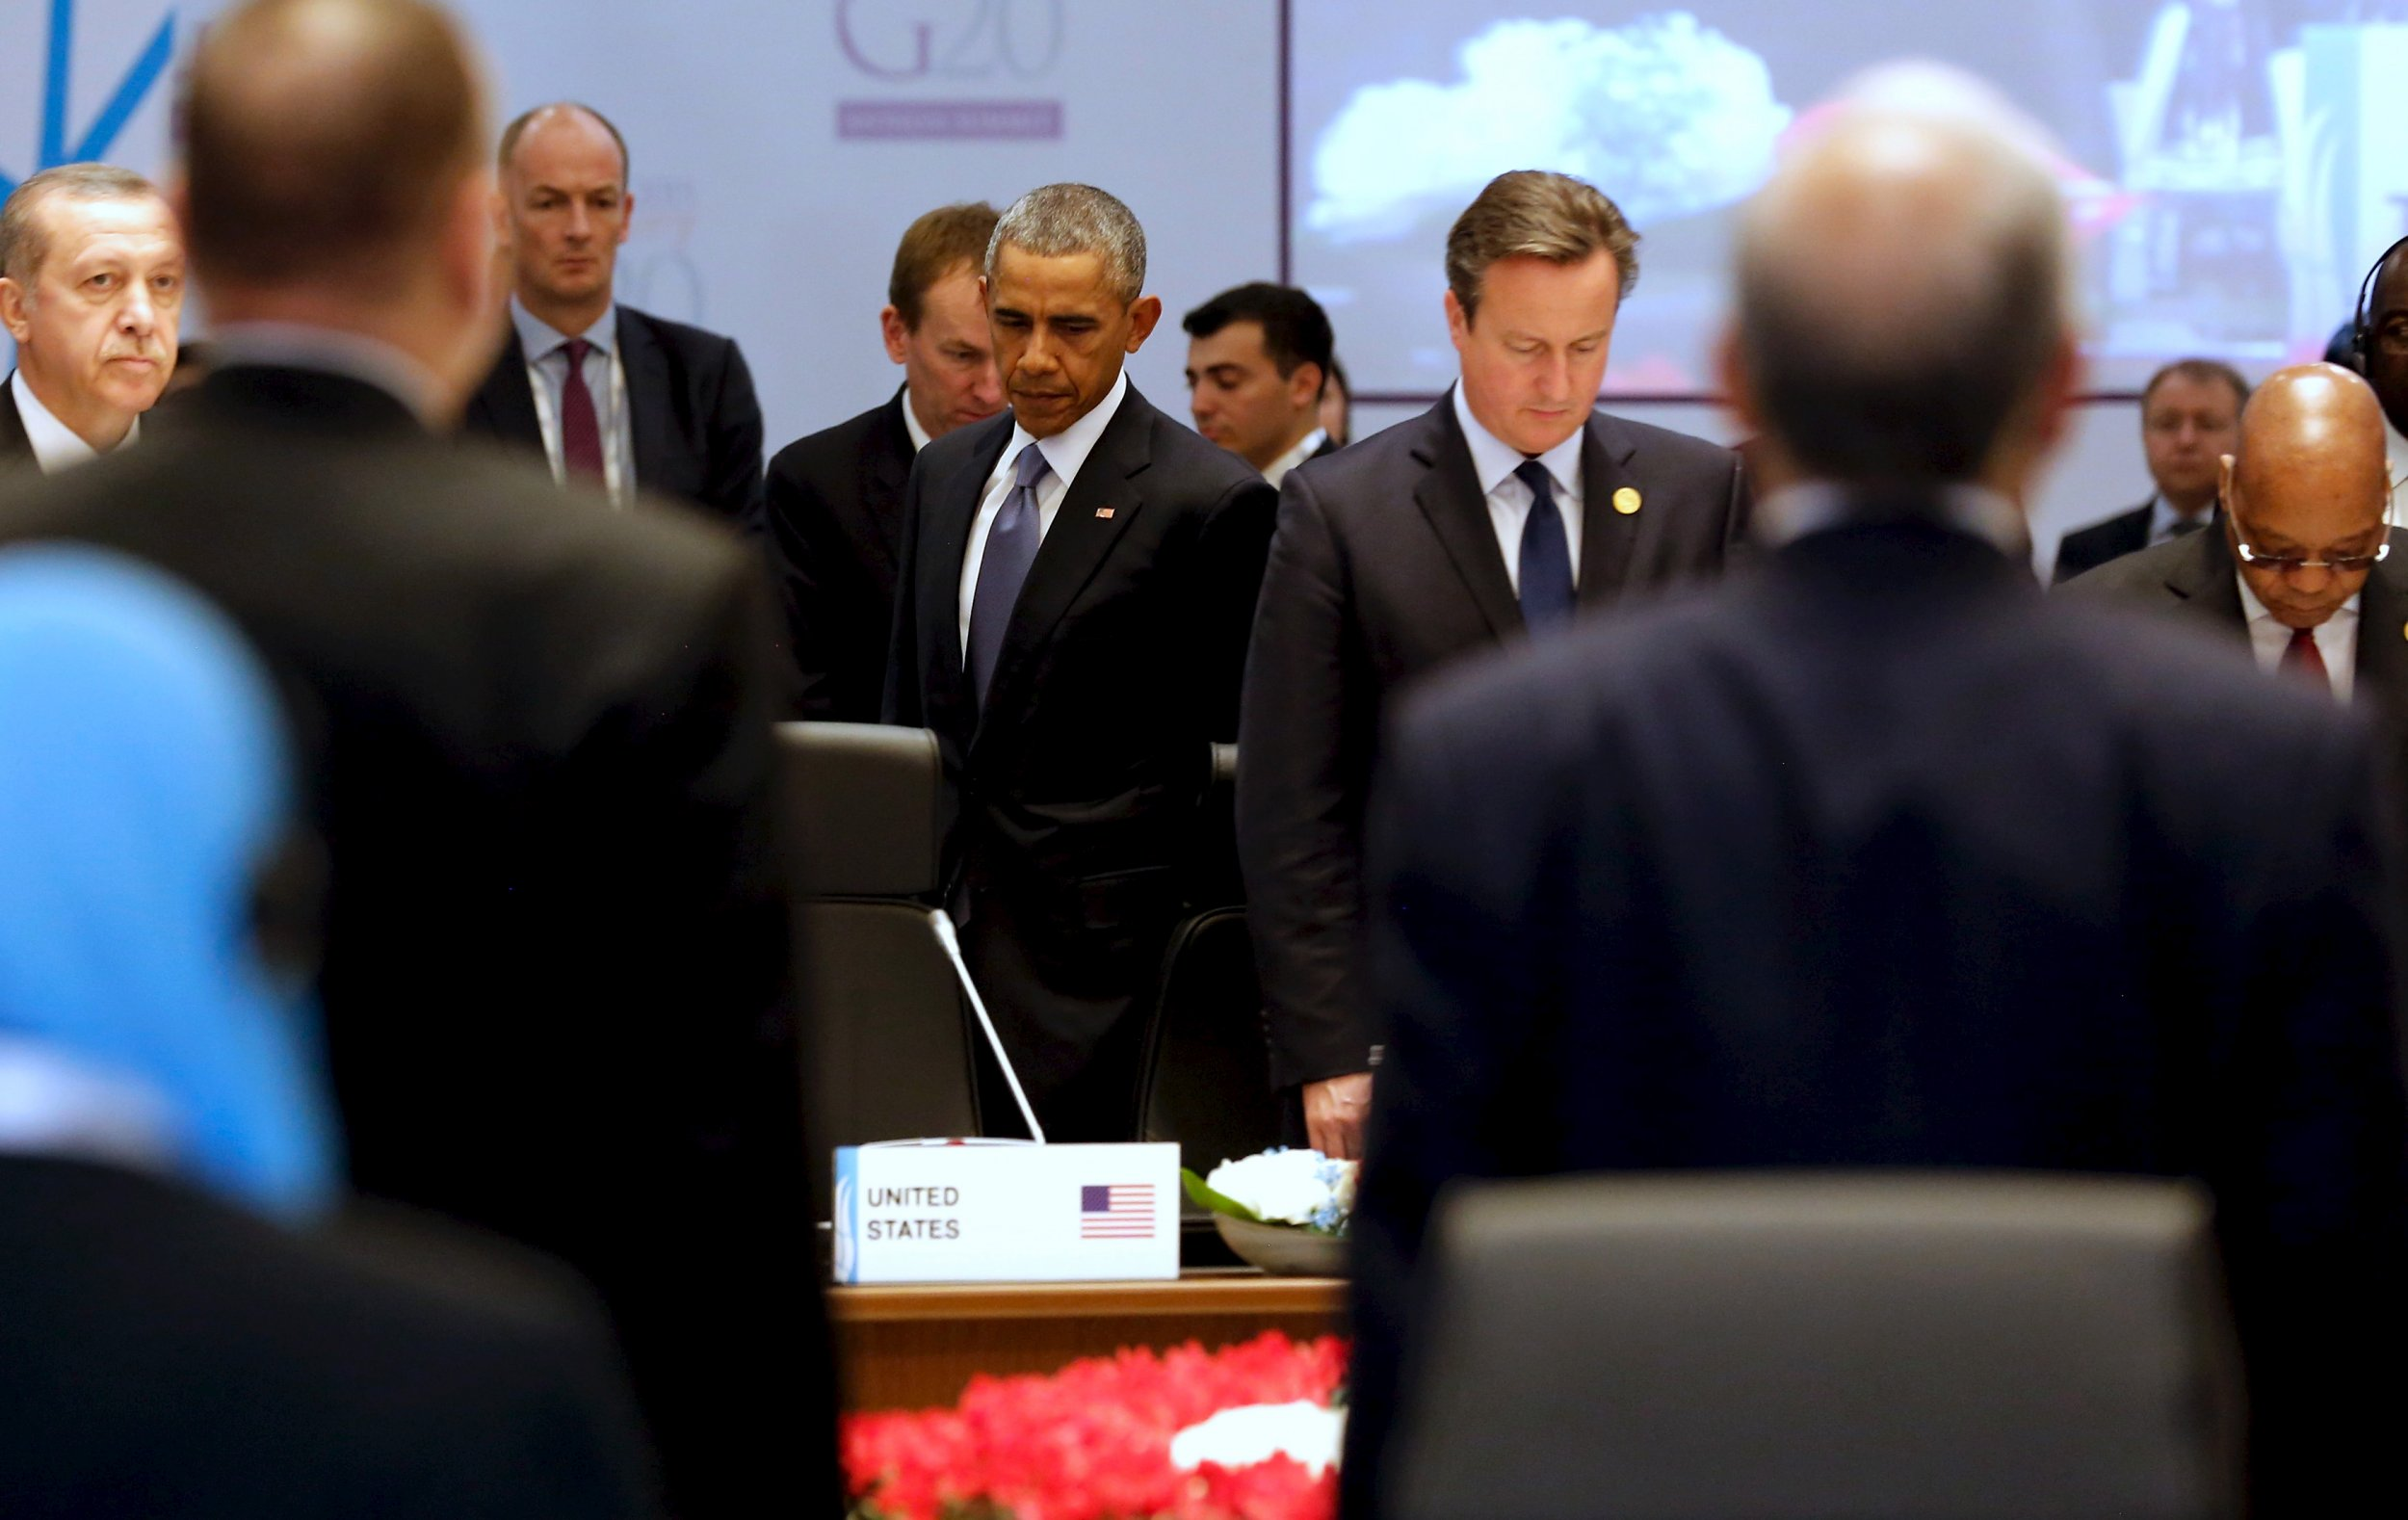 1119_Obama Attacks Terrorism